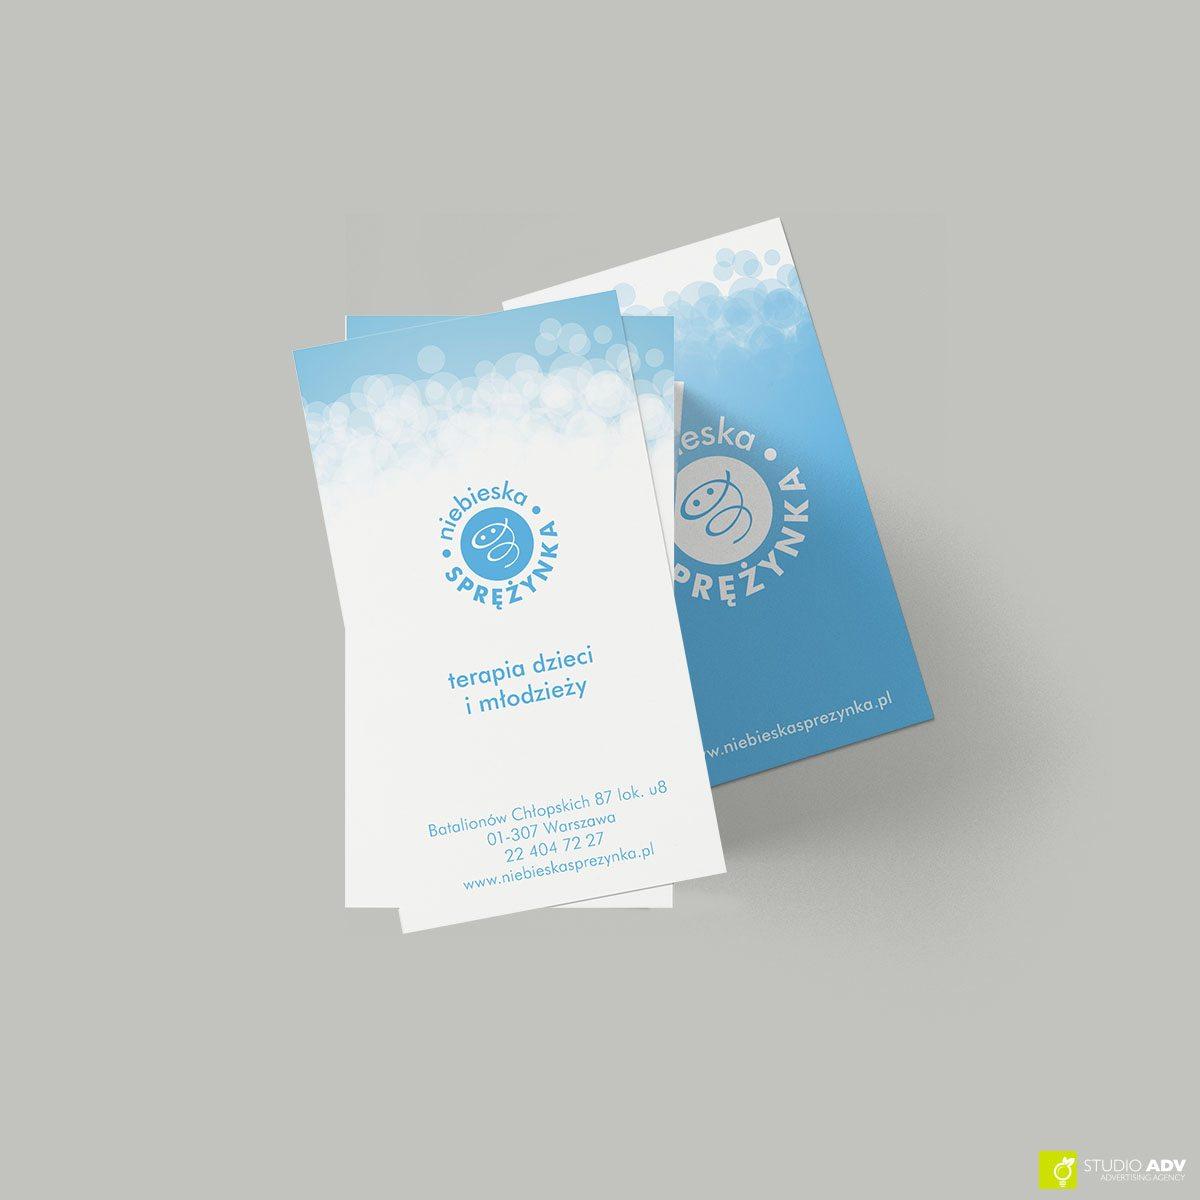 Niebieska Sprężynka Branding